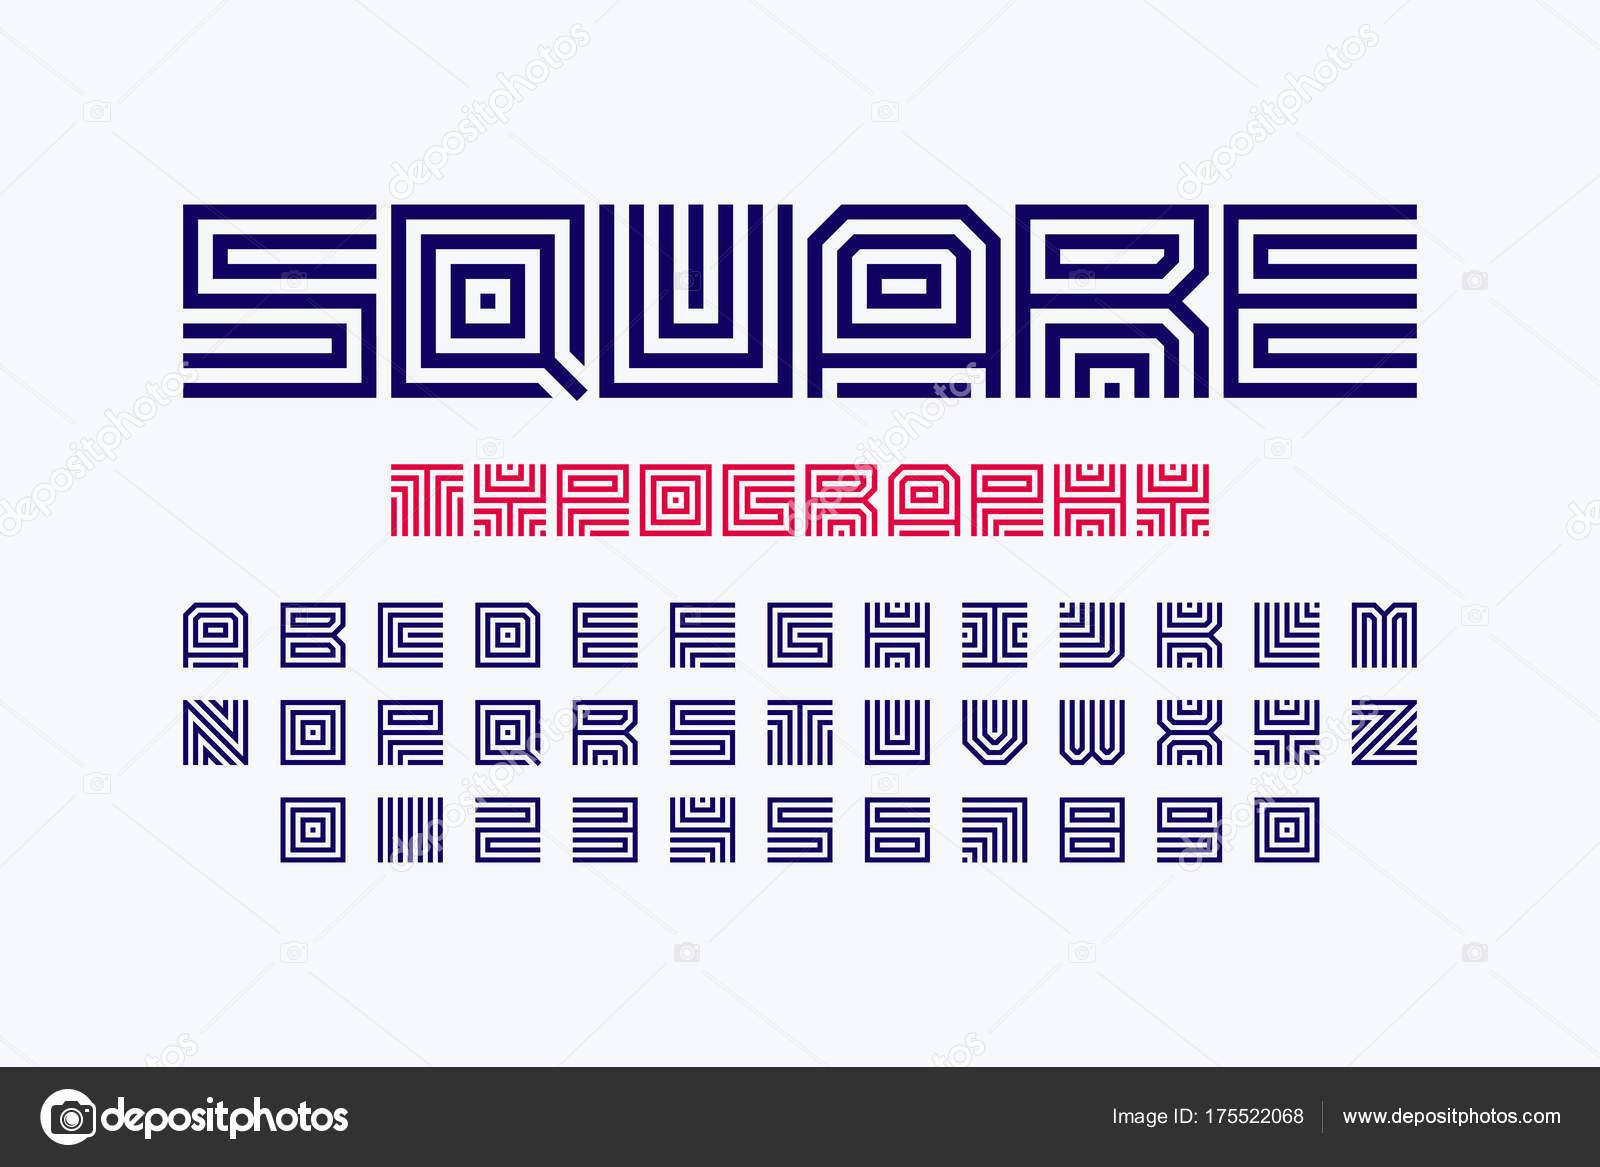 Quadratische Form Briefe Lineare Schrift Stockvektor Alhovik